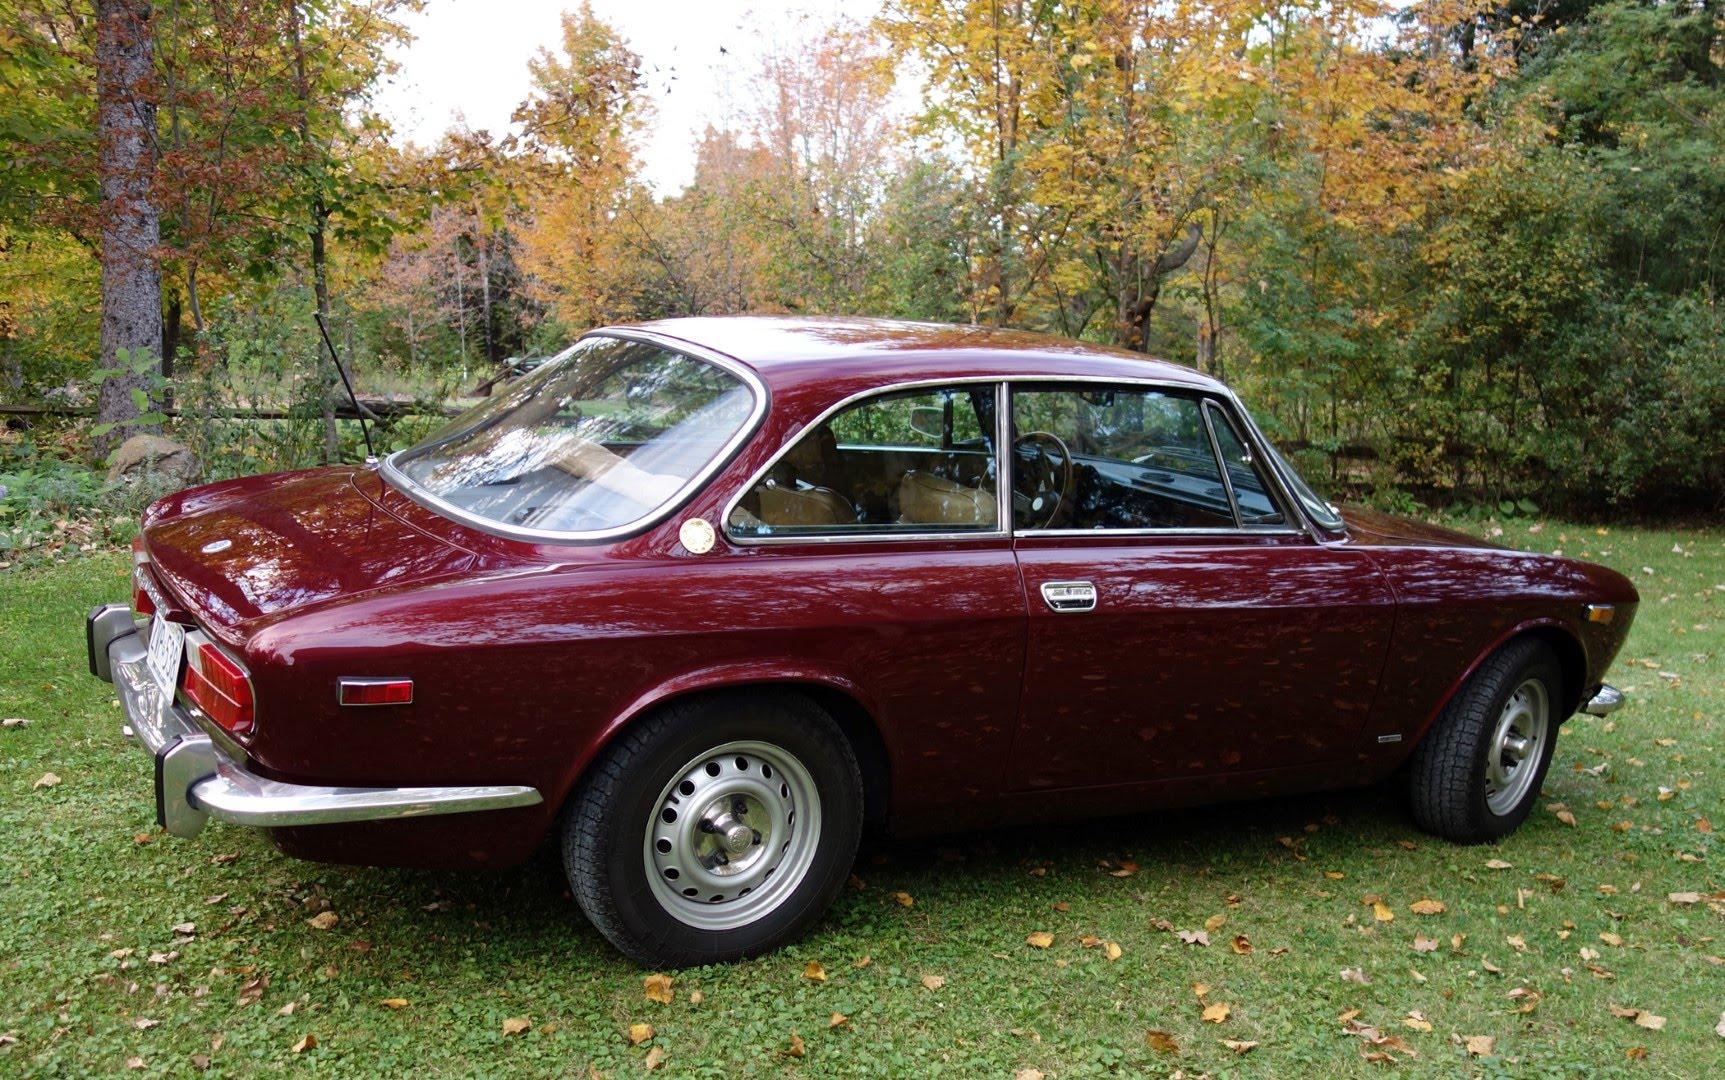 1974 GTV - Read Collacott